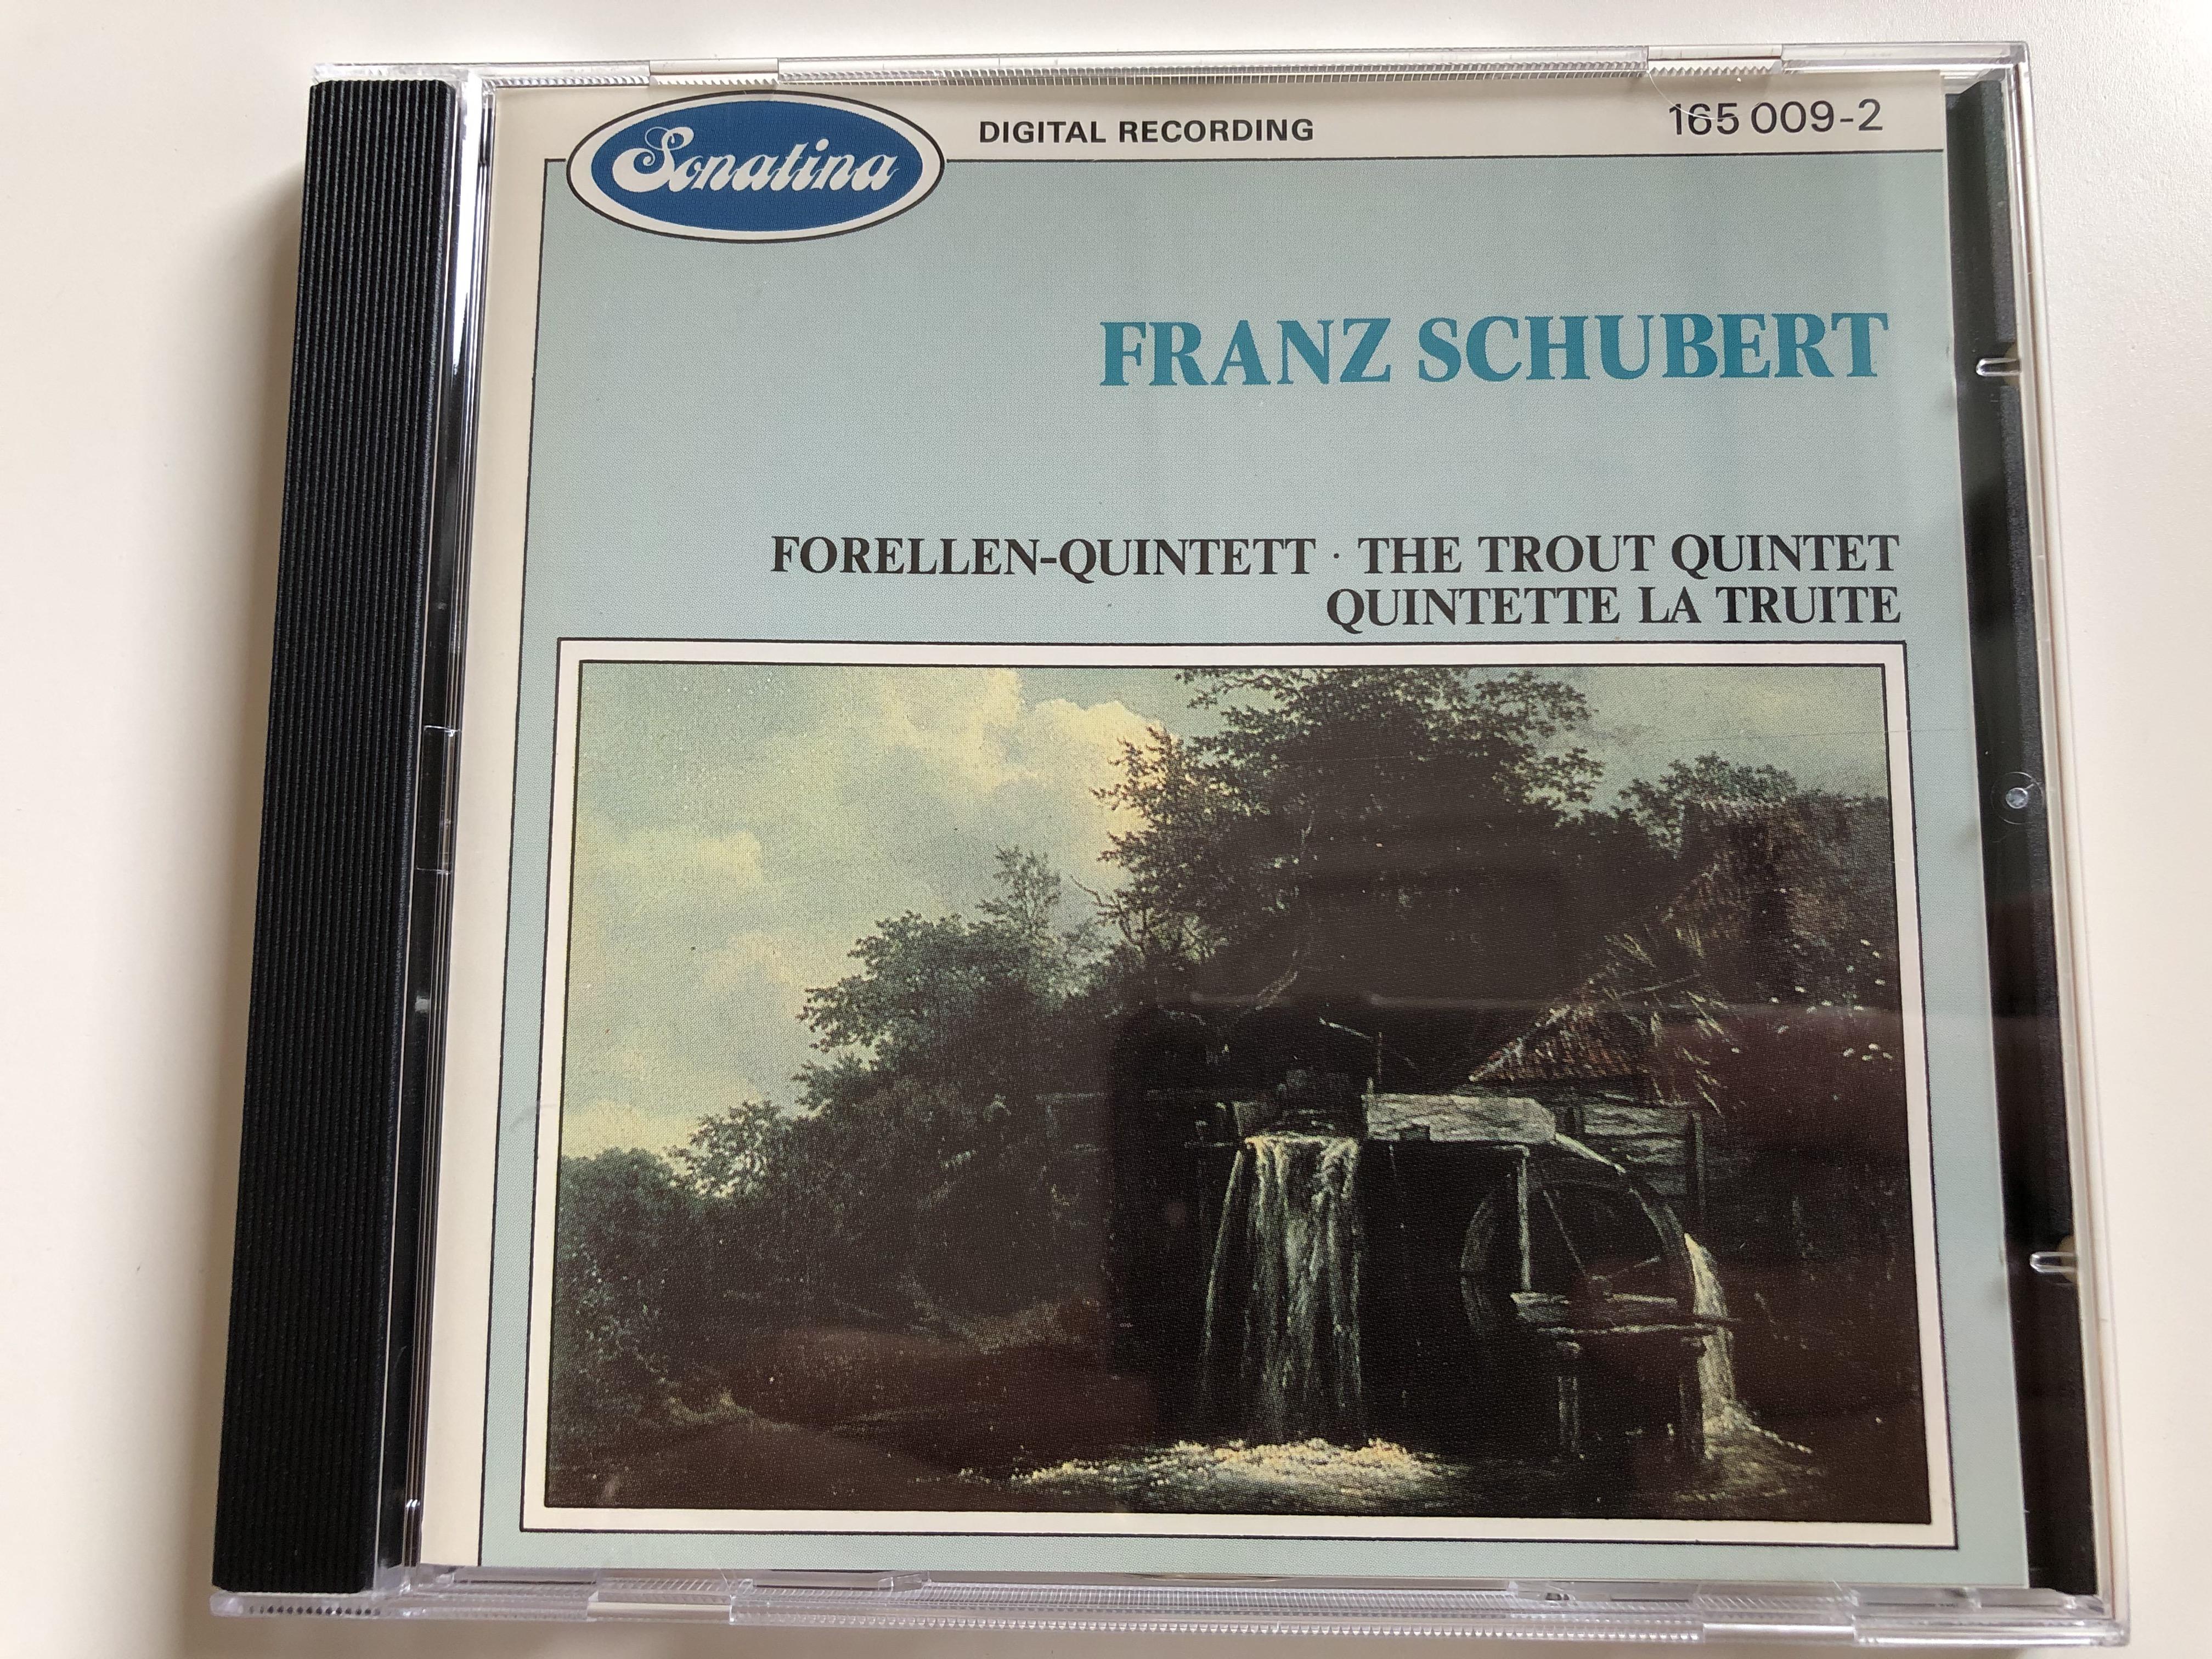 franz-schubert-forellen-quintett-the-trout-quintet-quintette-la-truite-sonatina-audio-cd-1986-stereo-165-009-2-1-.jpg